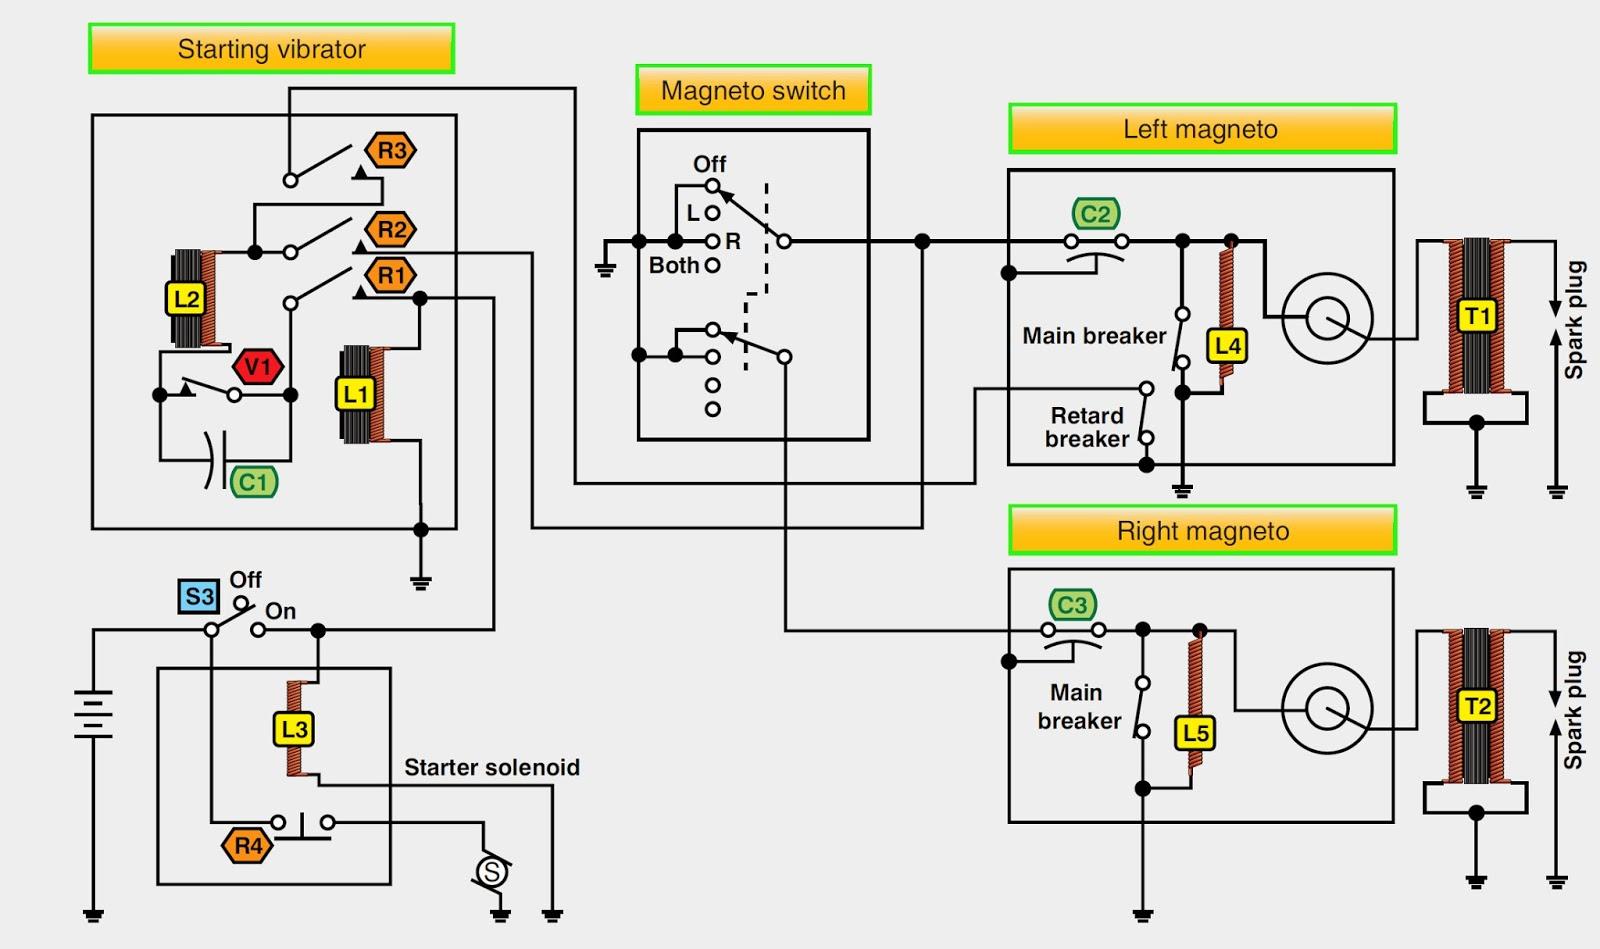 Magneto Wiring Diagram Trailer Brake Light Bendix Switch Library